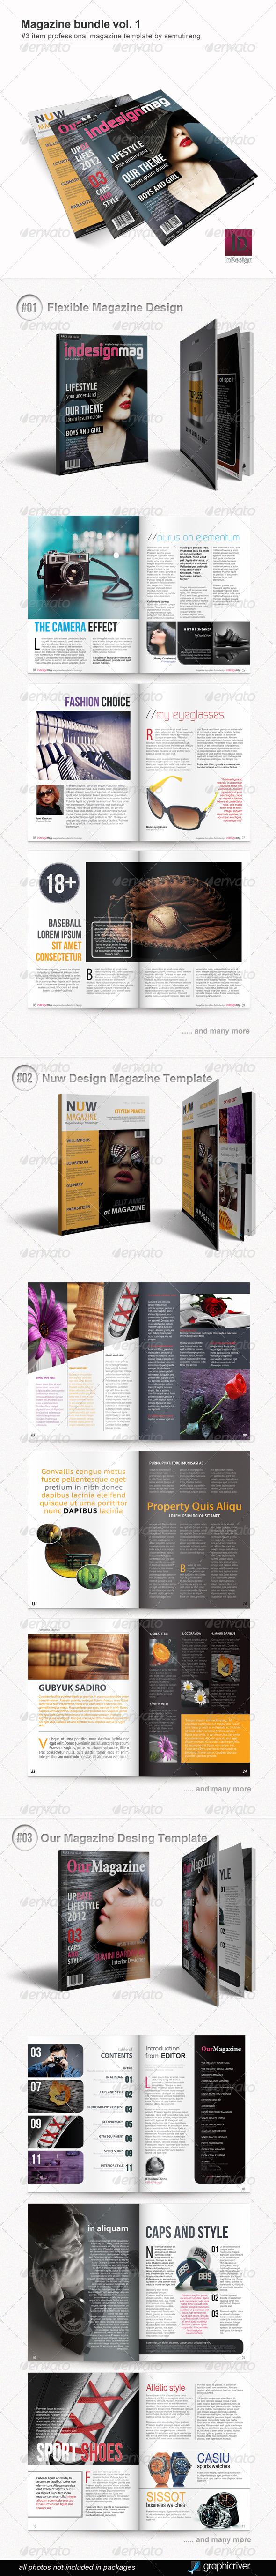 GraphicRiver Magazine Bundle Vol 1 5047543